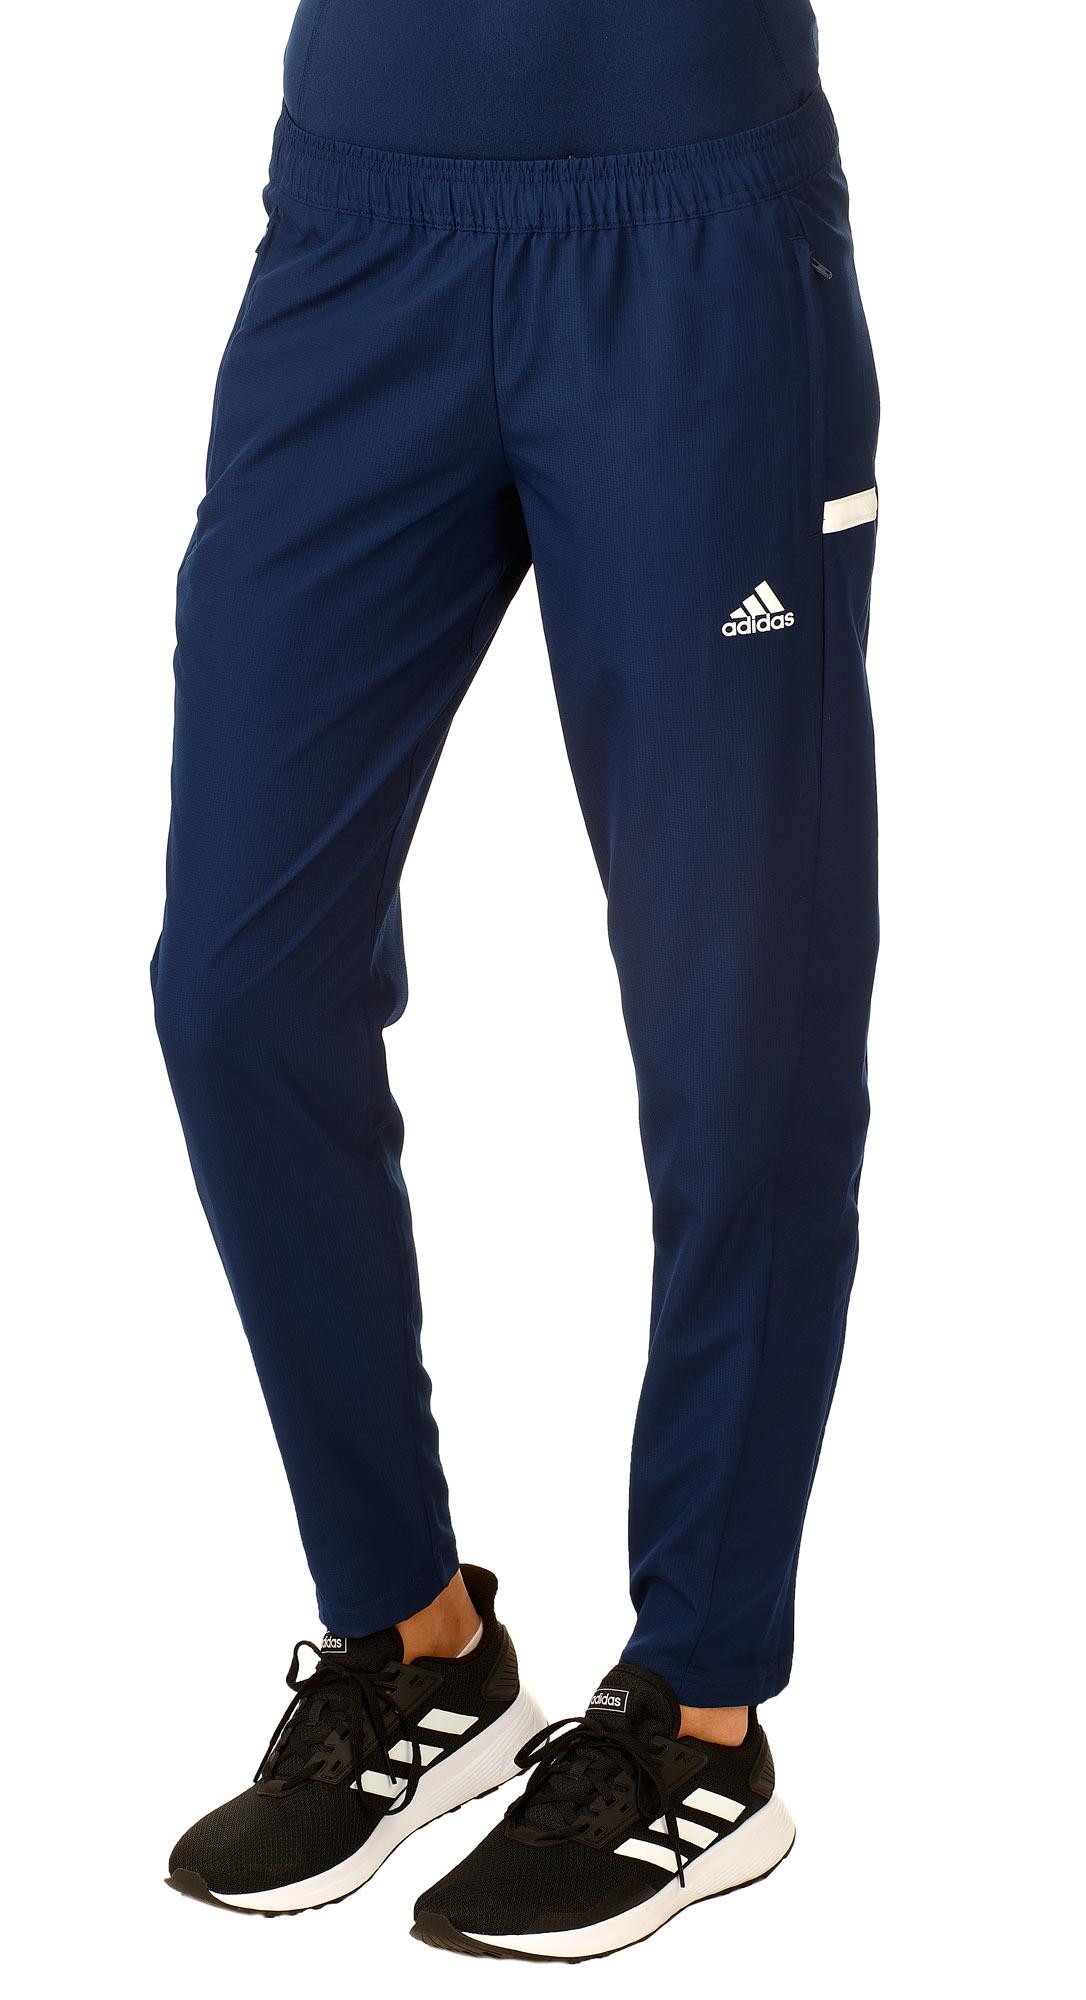 adidas T19 Woven Pants Damen blauweiß, DY8807